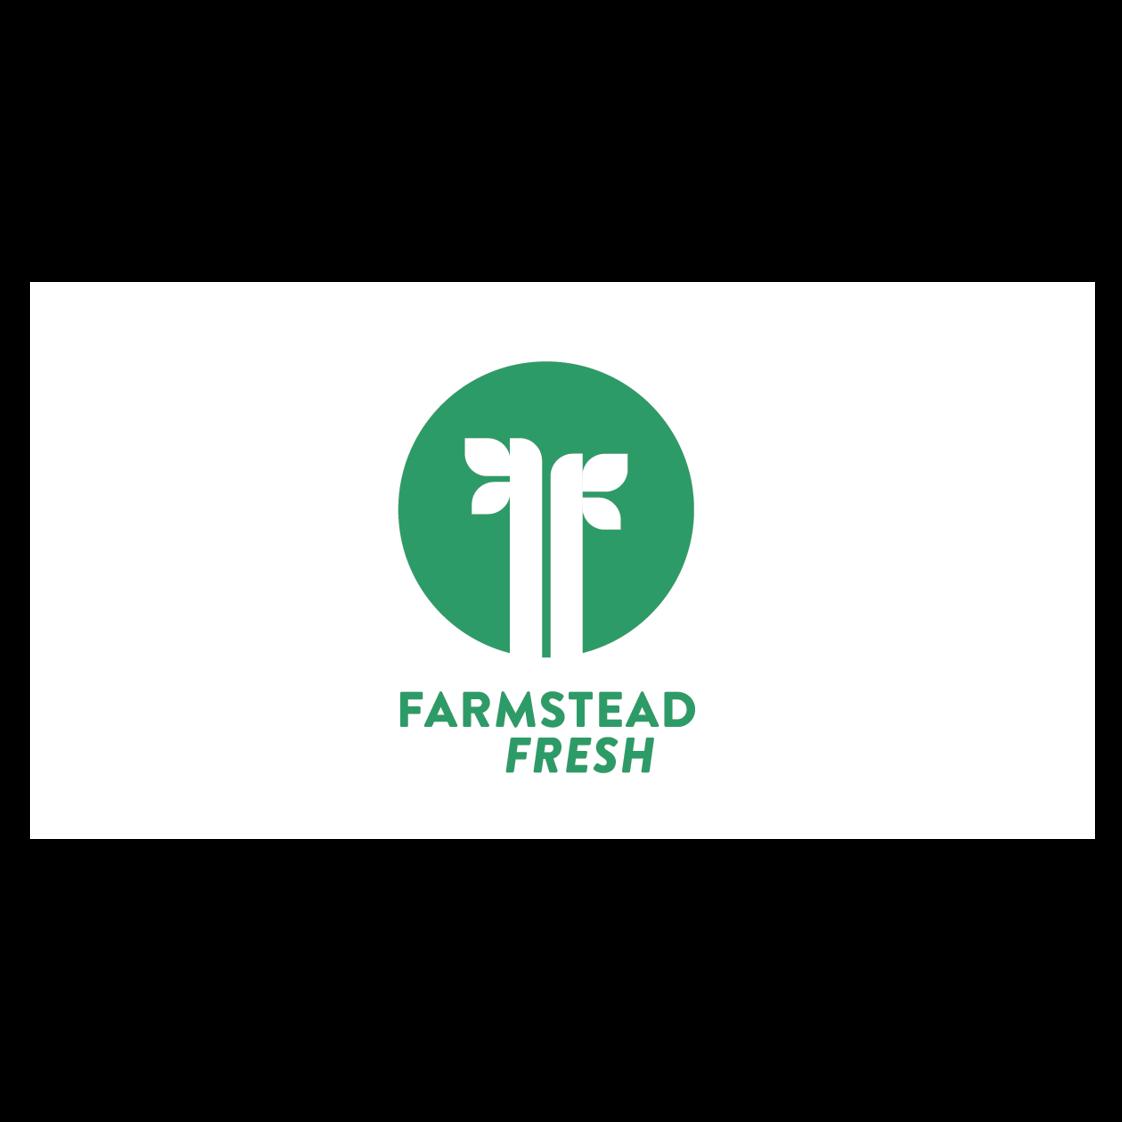 Farmstead Fresh